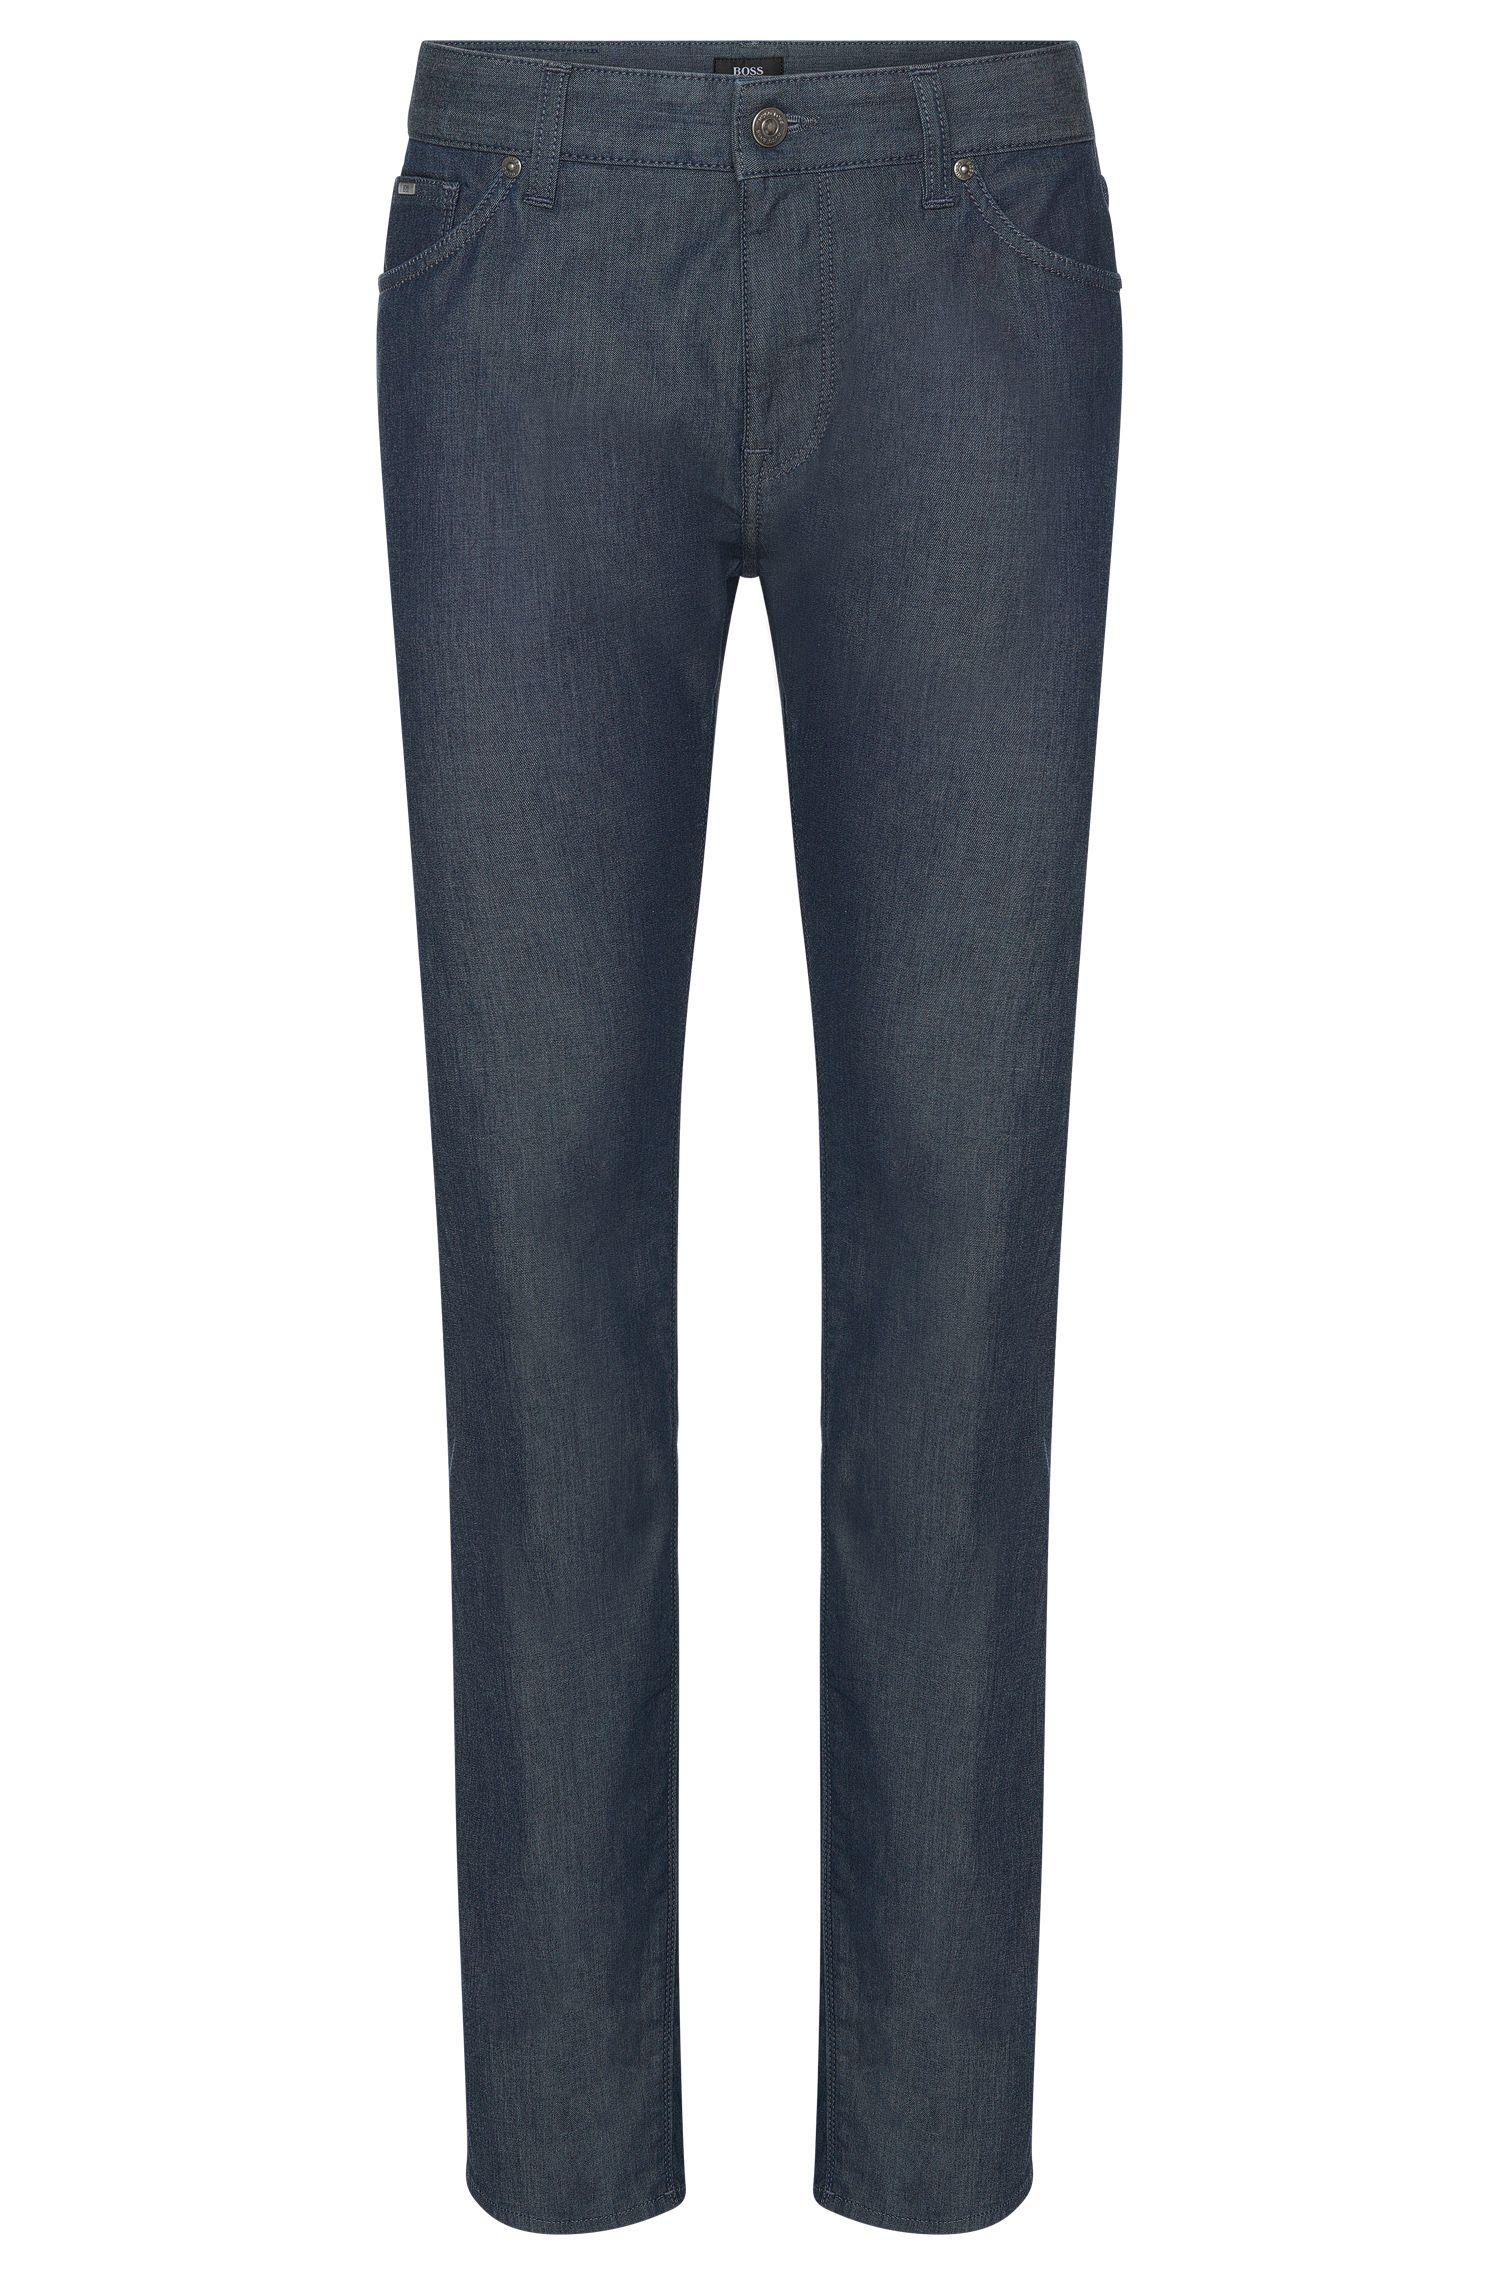 6.5 oz Stretch Cotton Jeans, Regular Fit | Maine